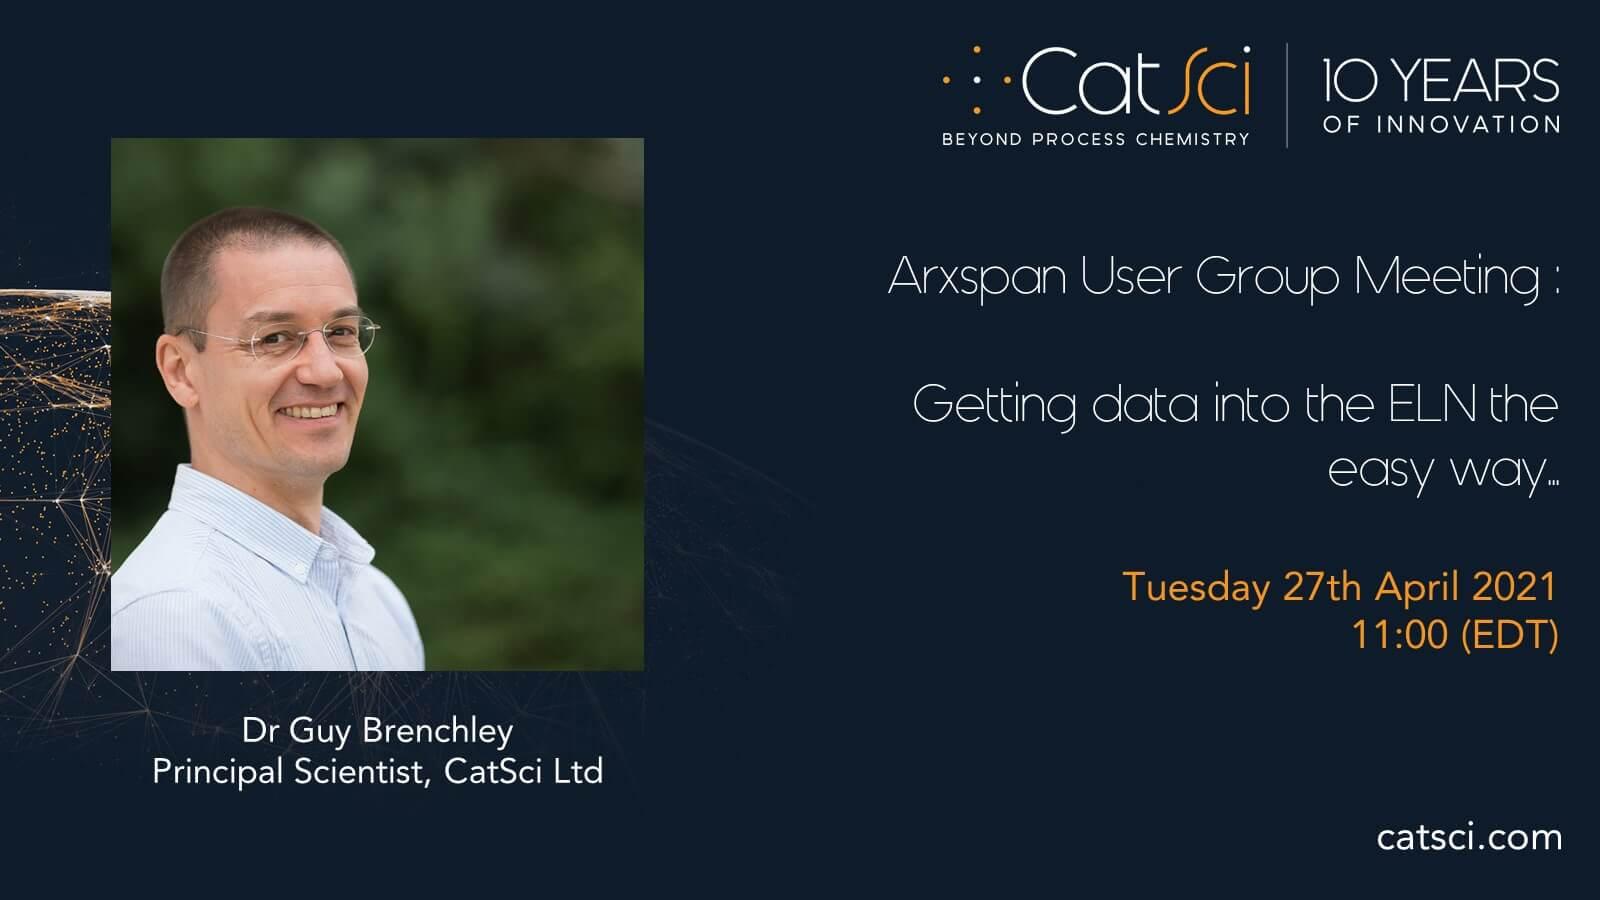 Arxspan User Group Meeting